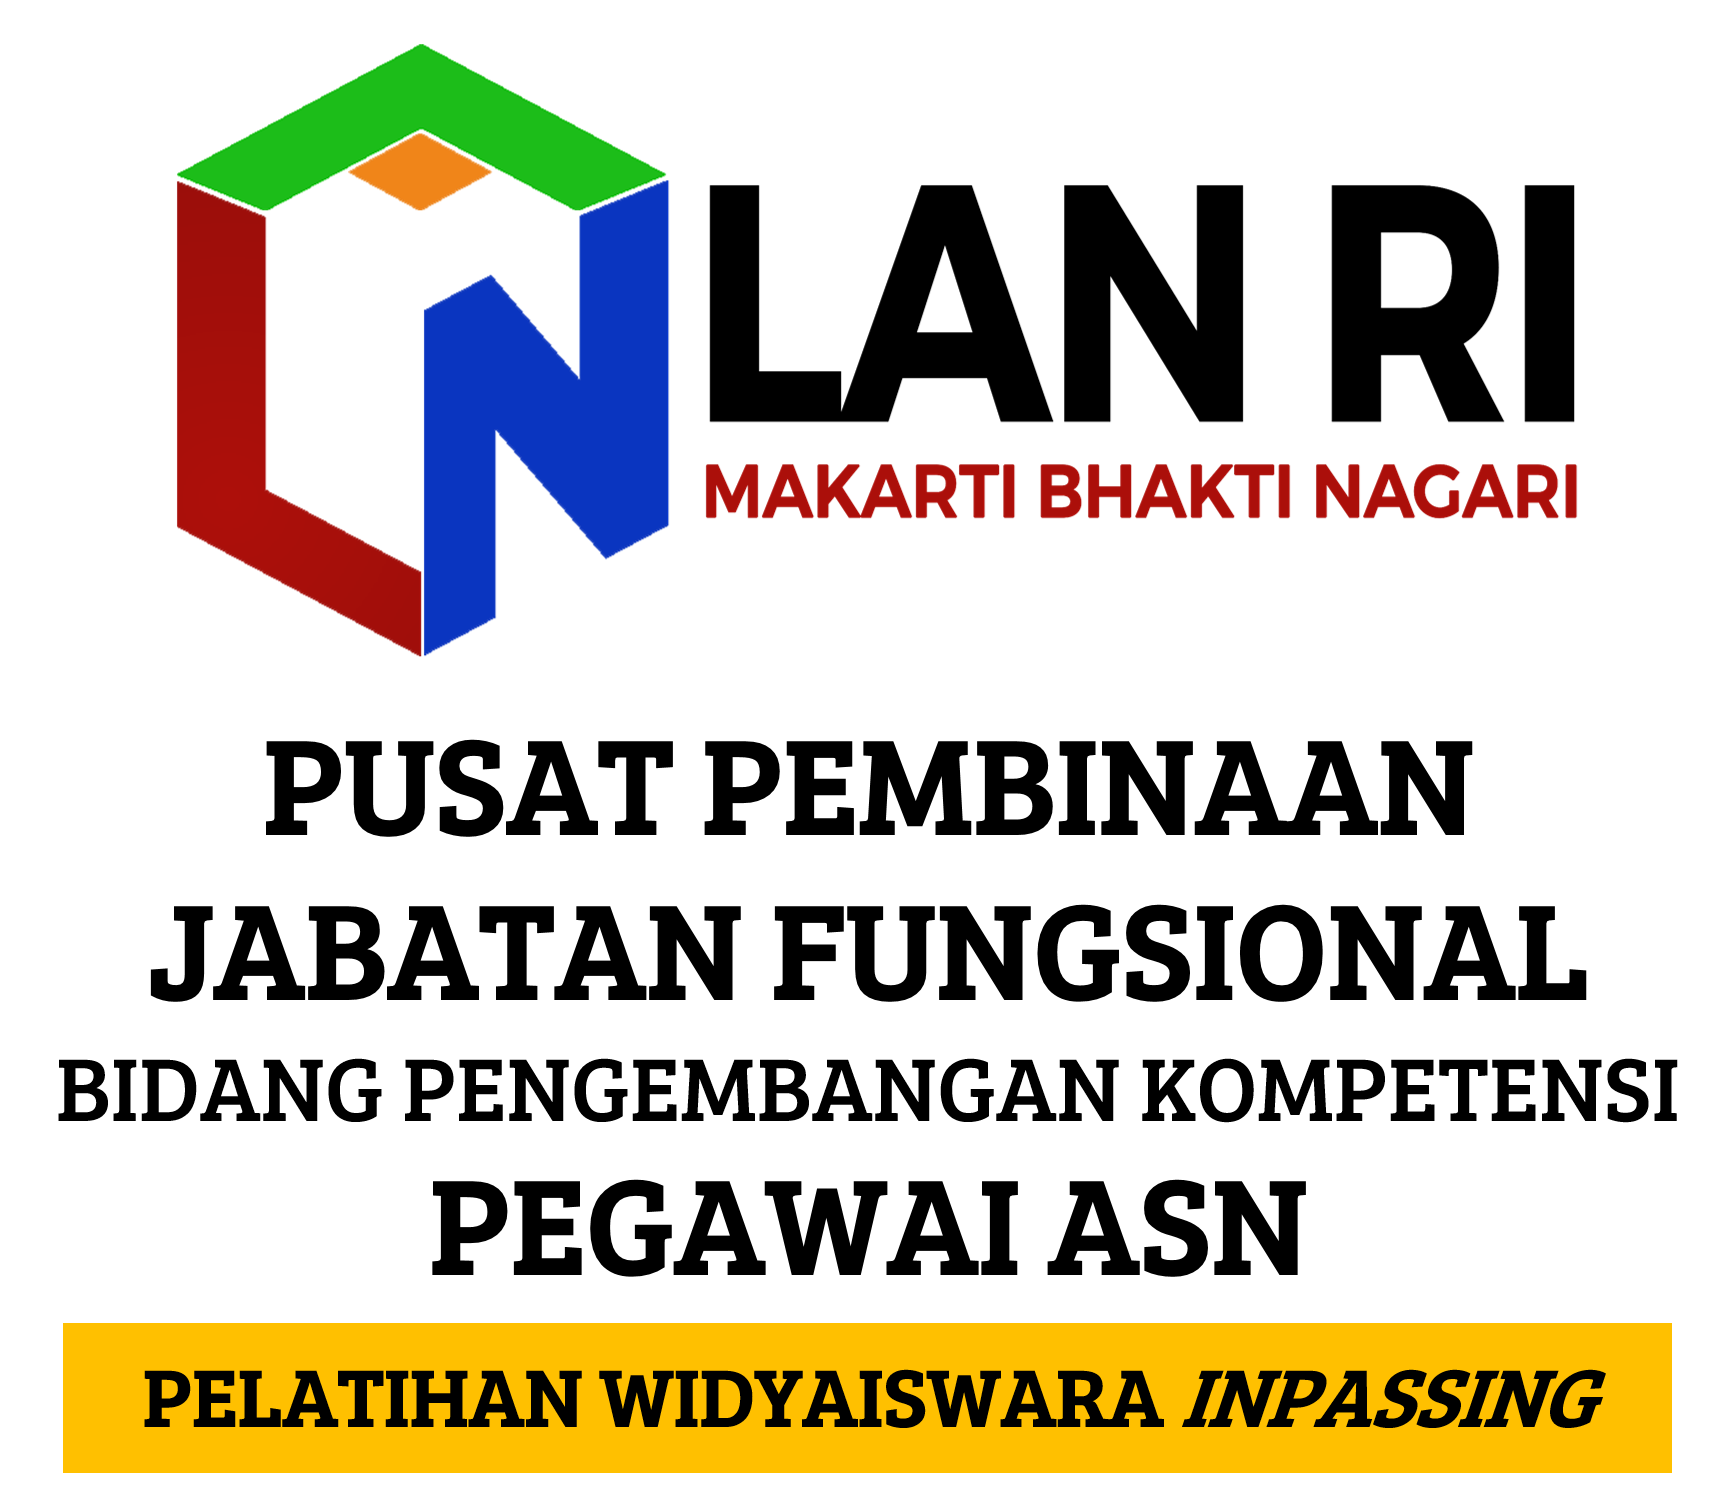 Piloting Pelatihan Widyaiswara Inpassing